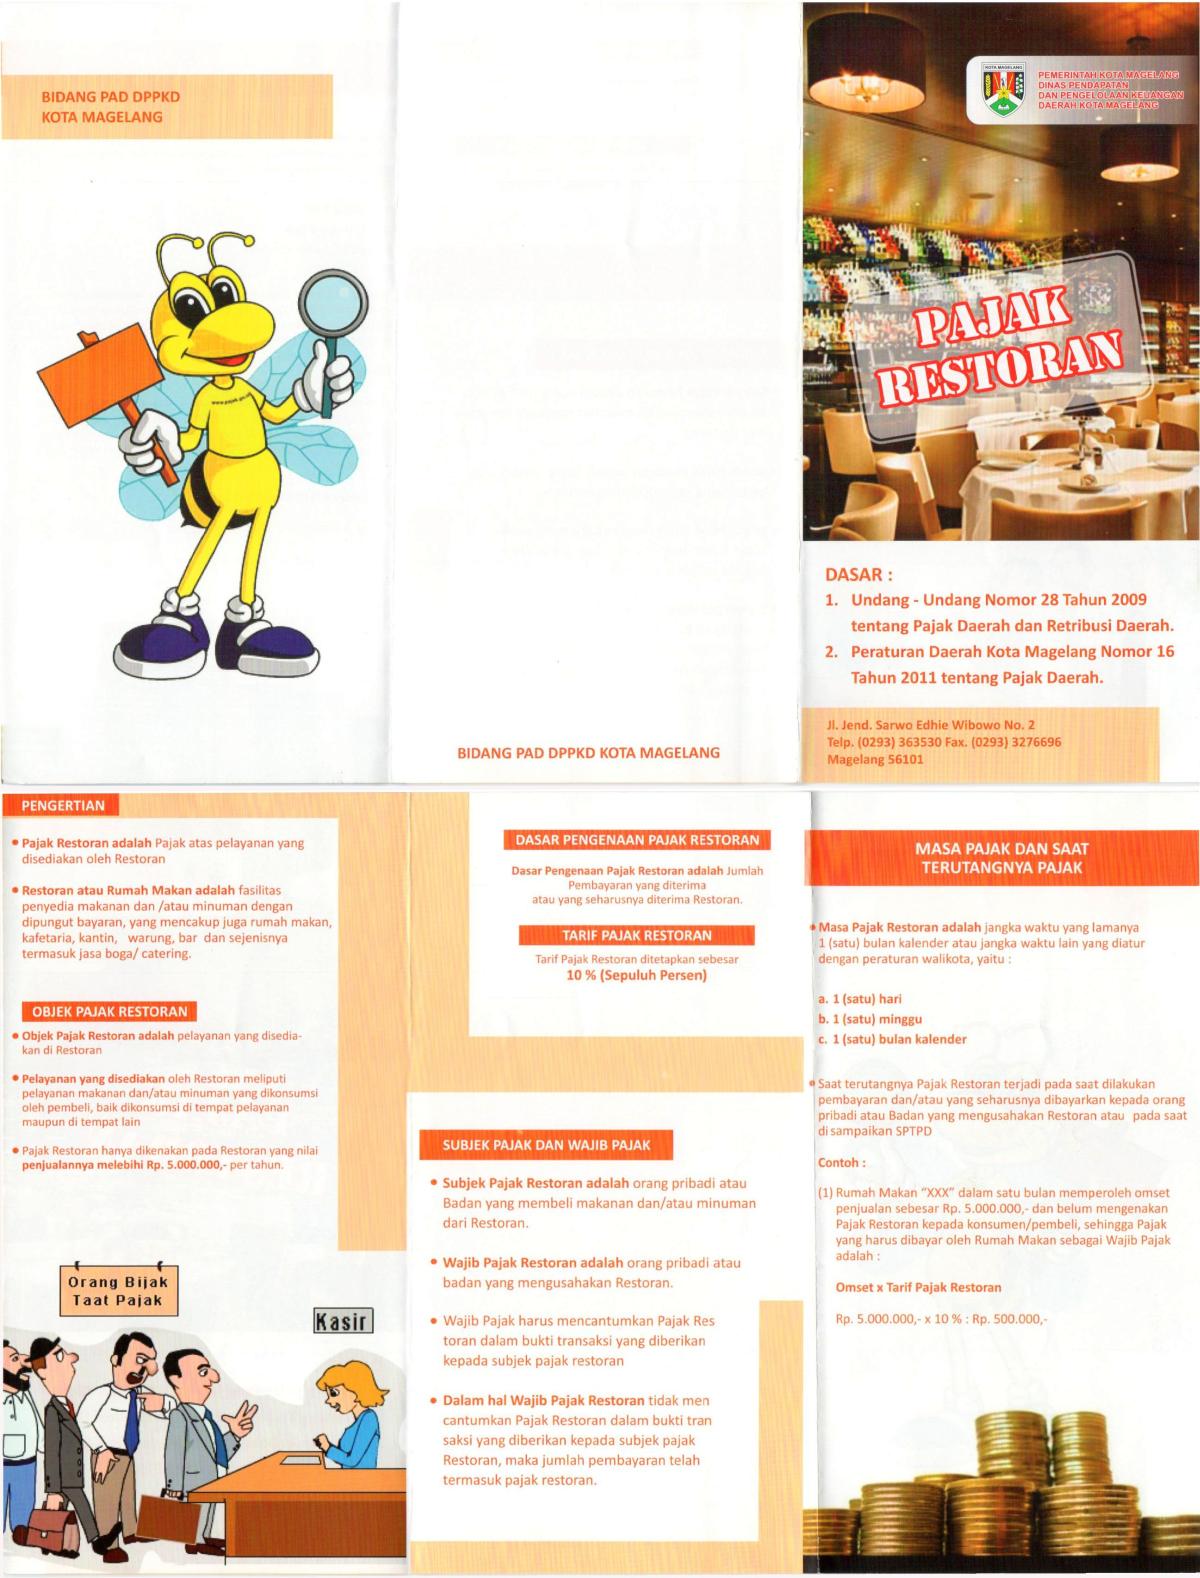 Pajak Restoran Bpkad Kota Magelang